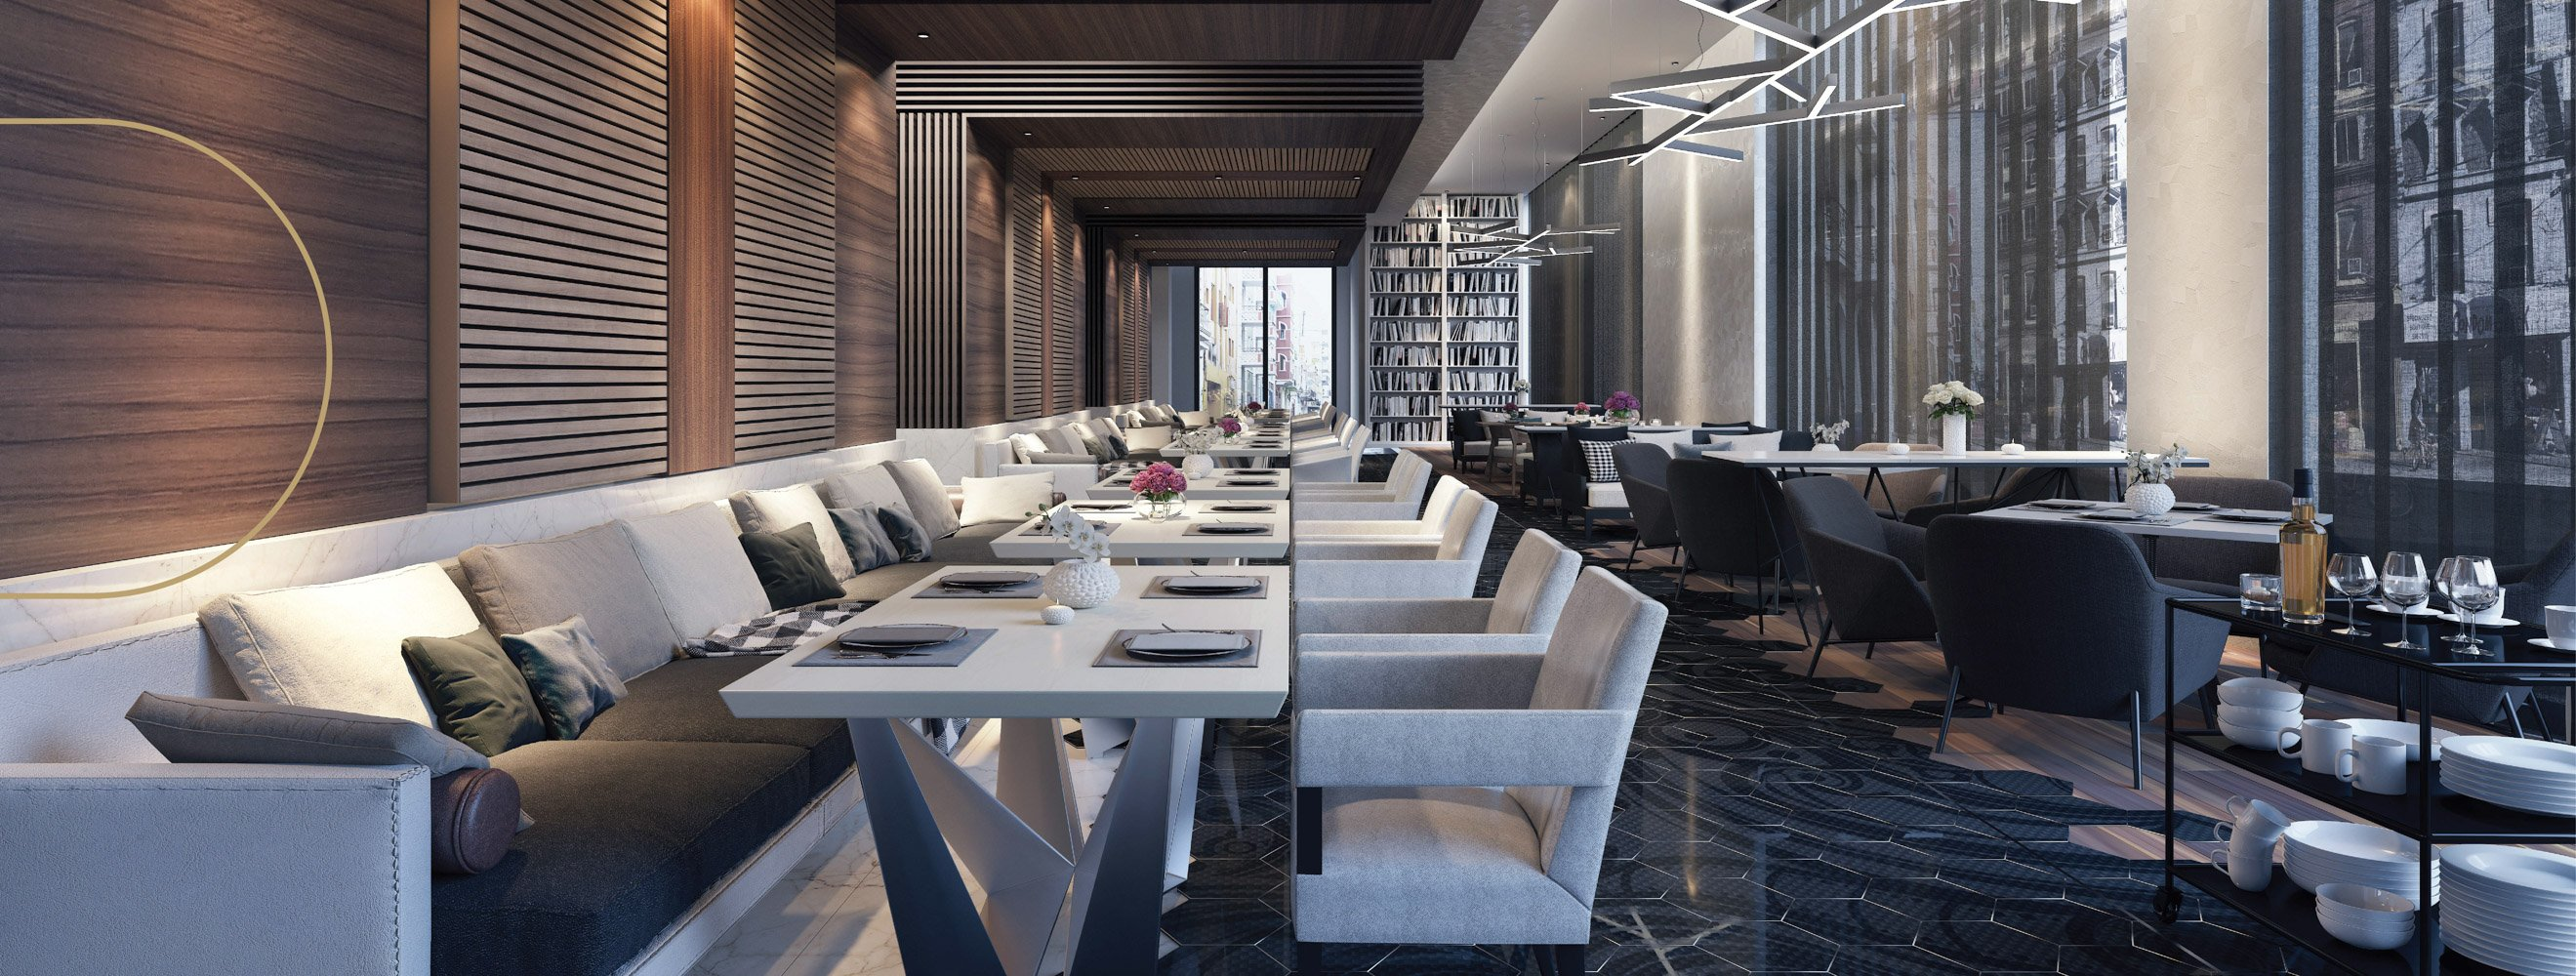 Authentic bar and restaurant interior design_banner